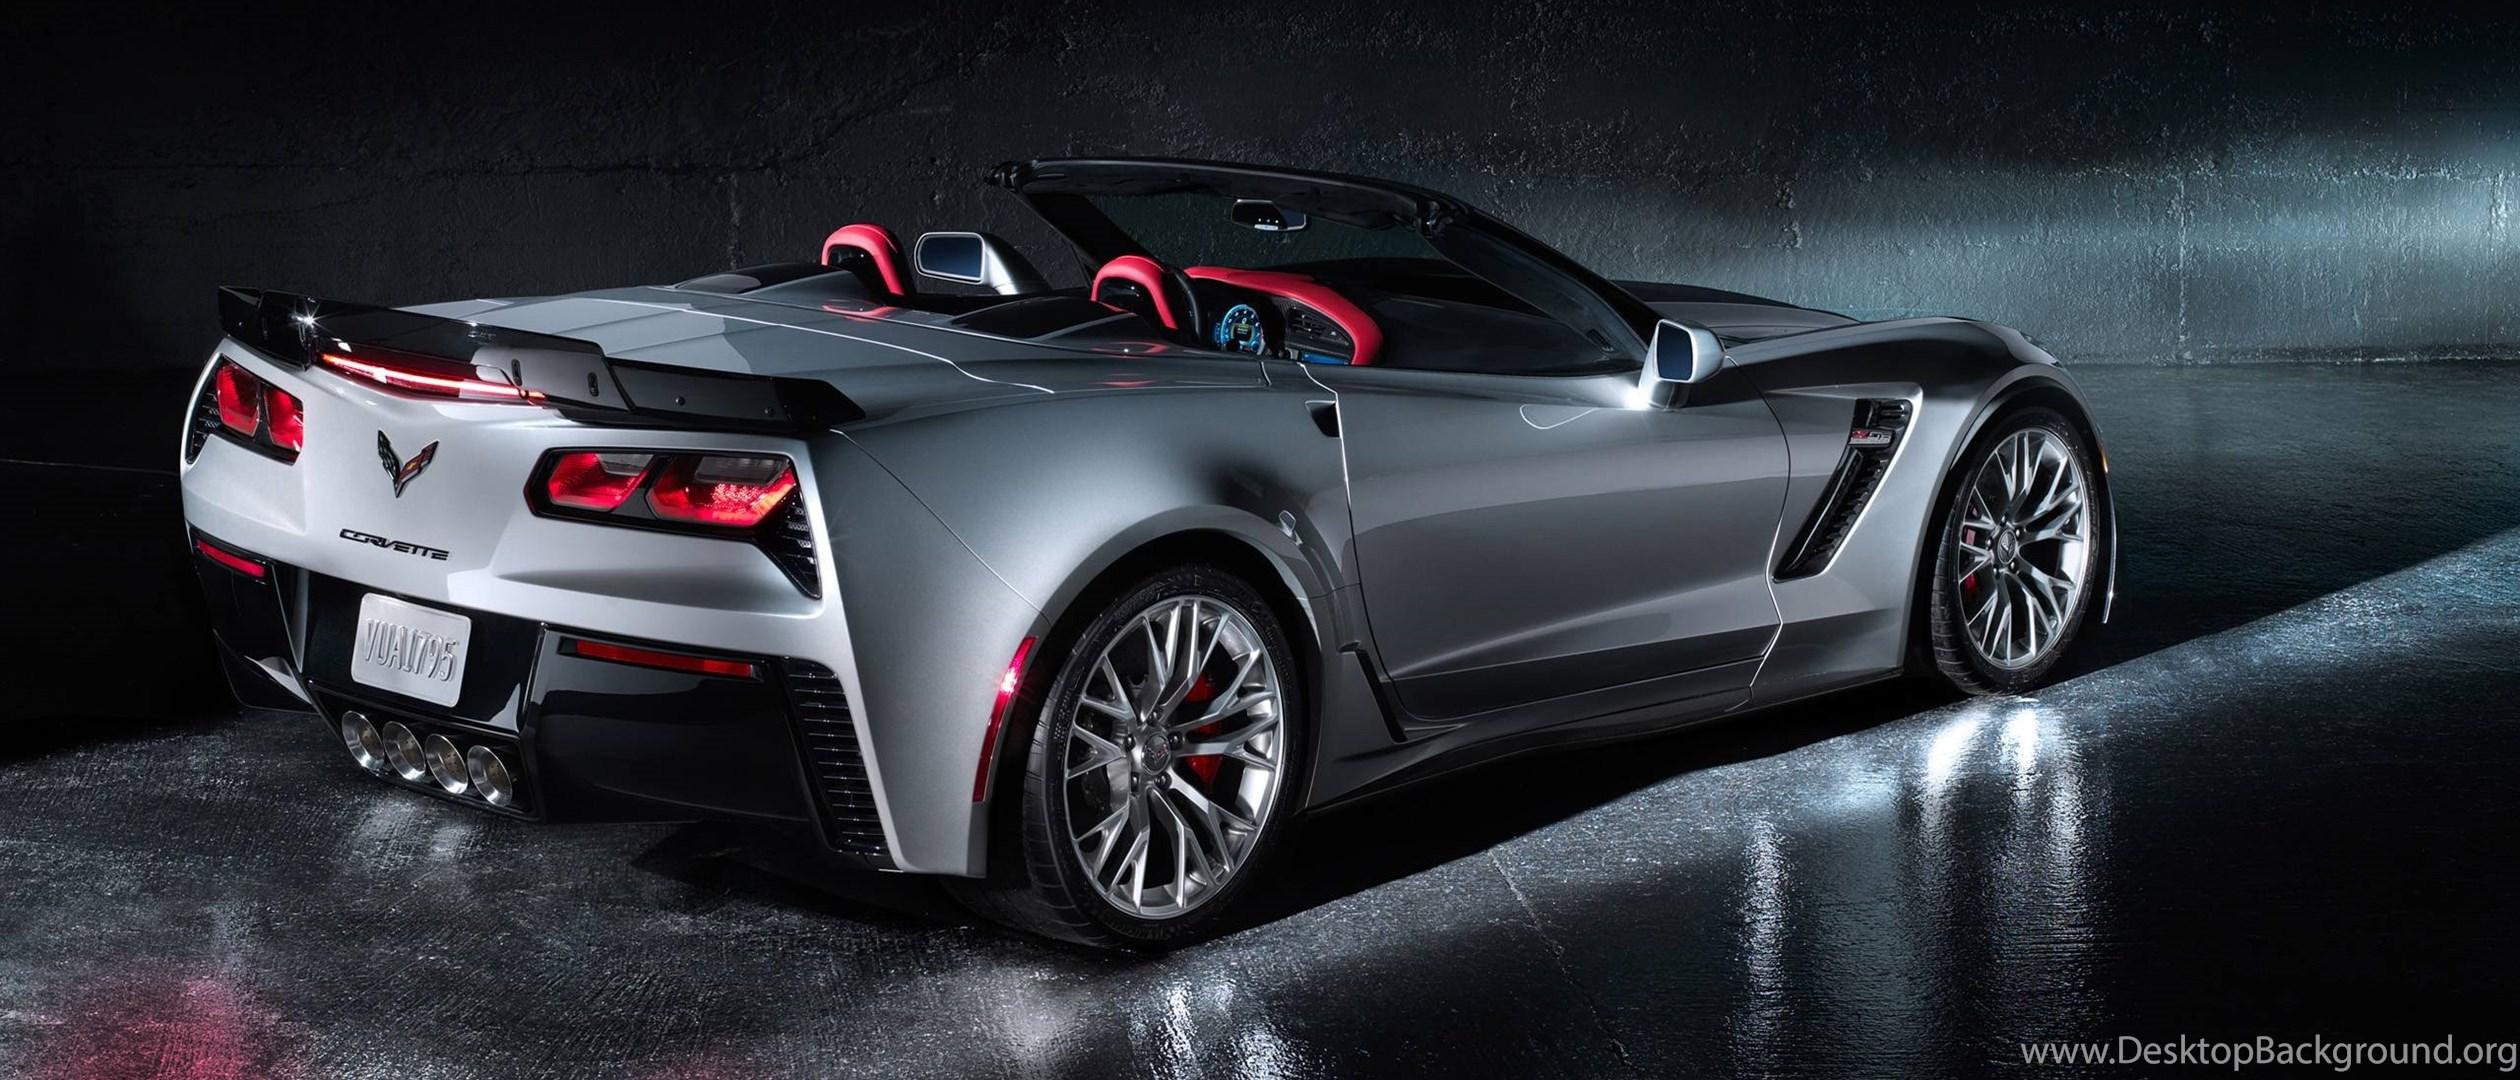 Chevrolet Corvette Z06 Wallpapers Hd Backgrounds Download Desktop Desktop Background